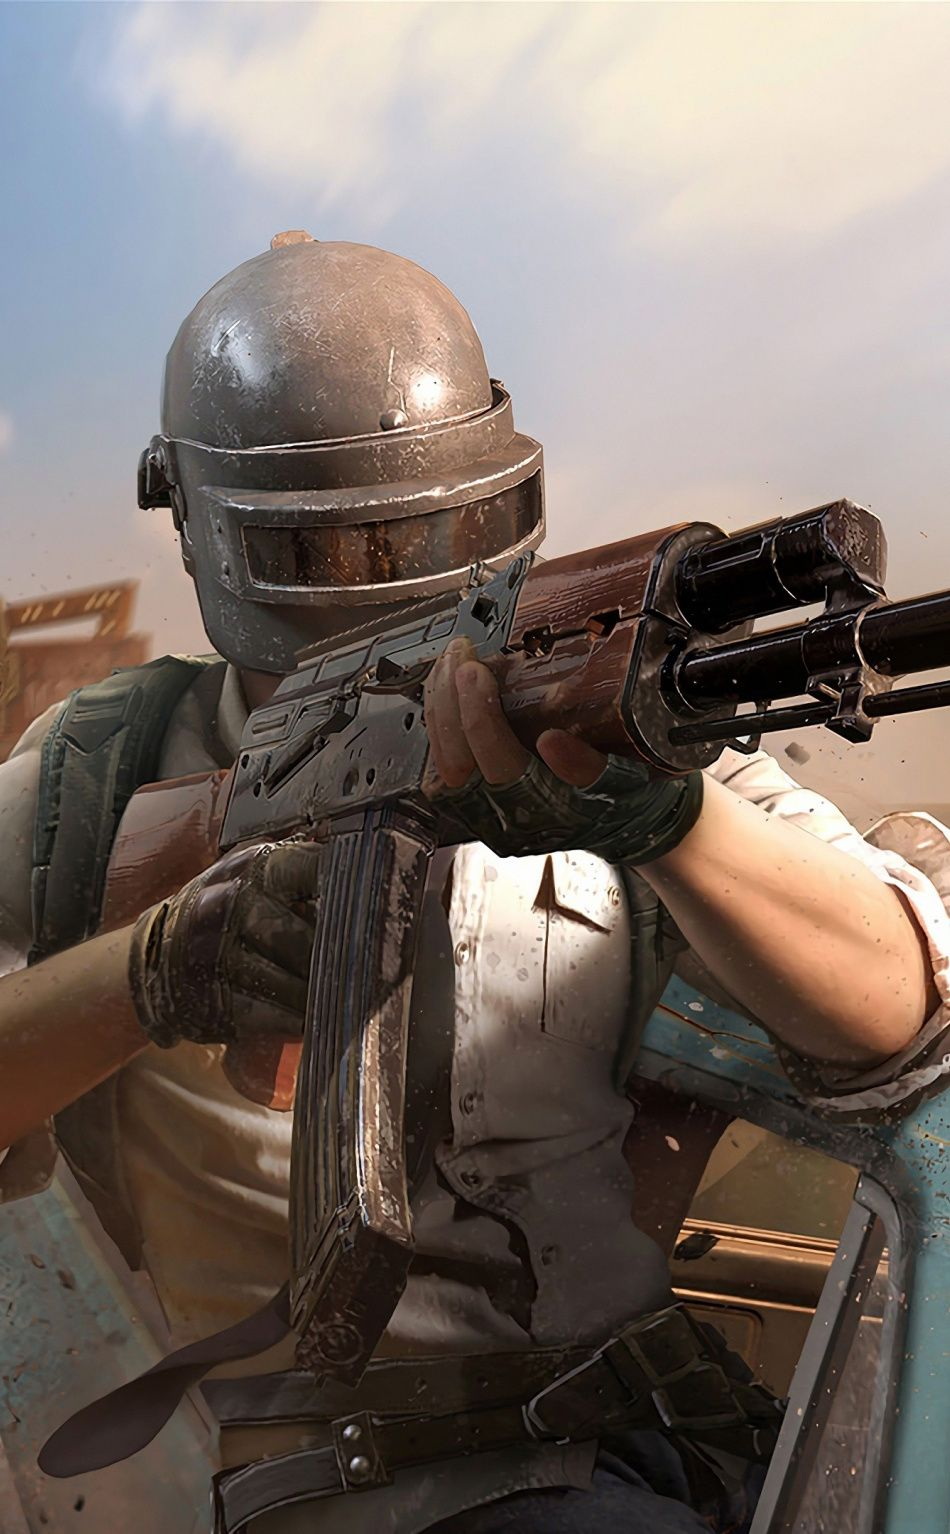 Pin on PlayerUnknown's Battlegrounds (PUBG)